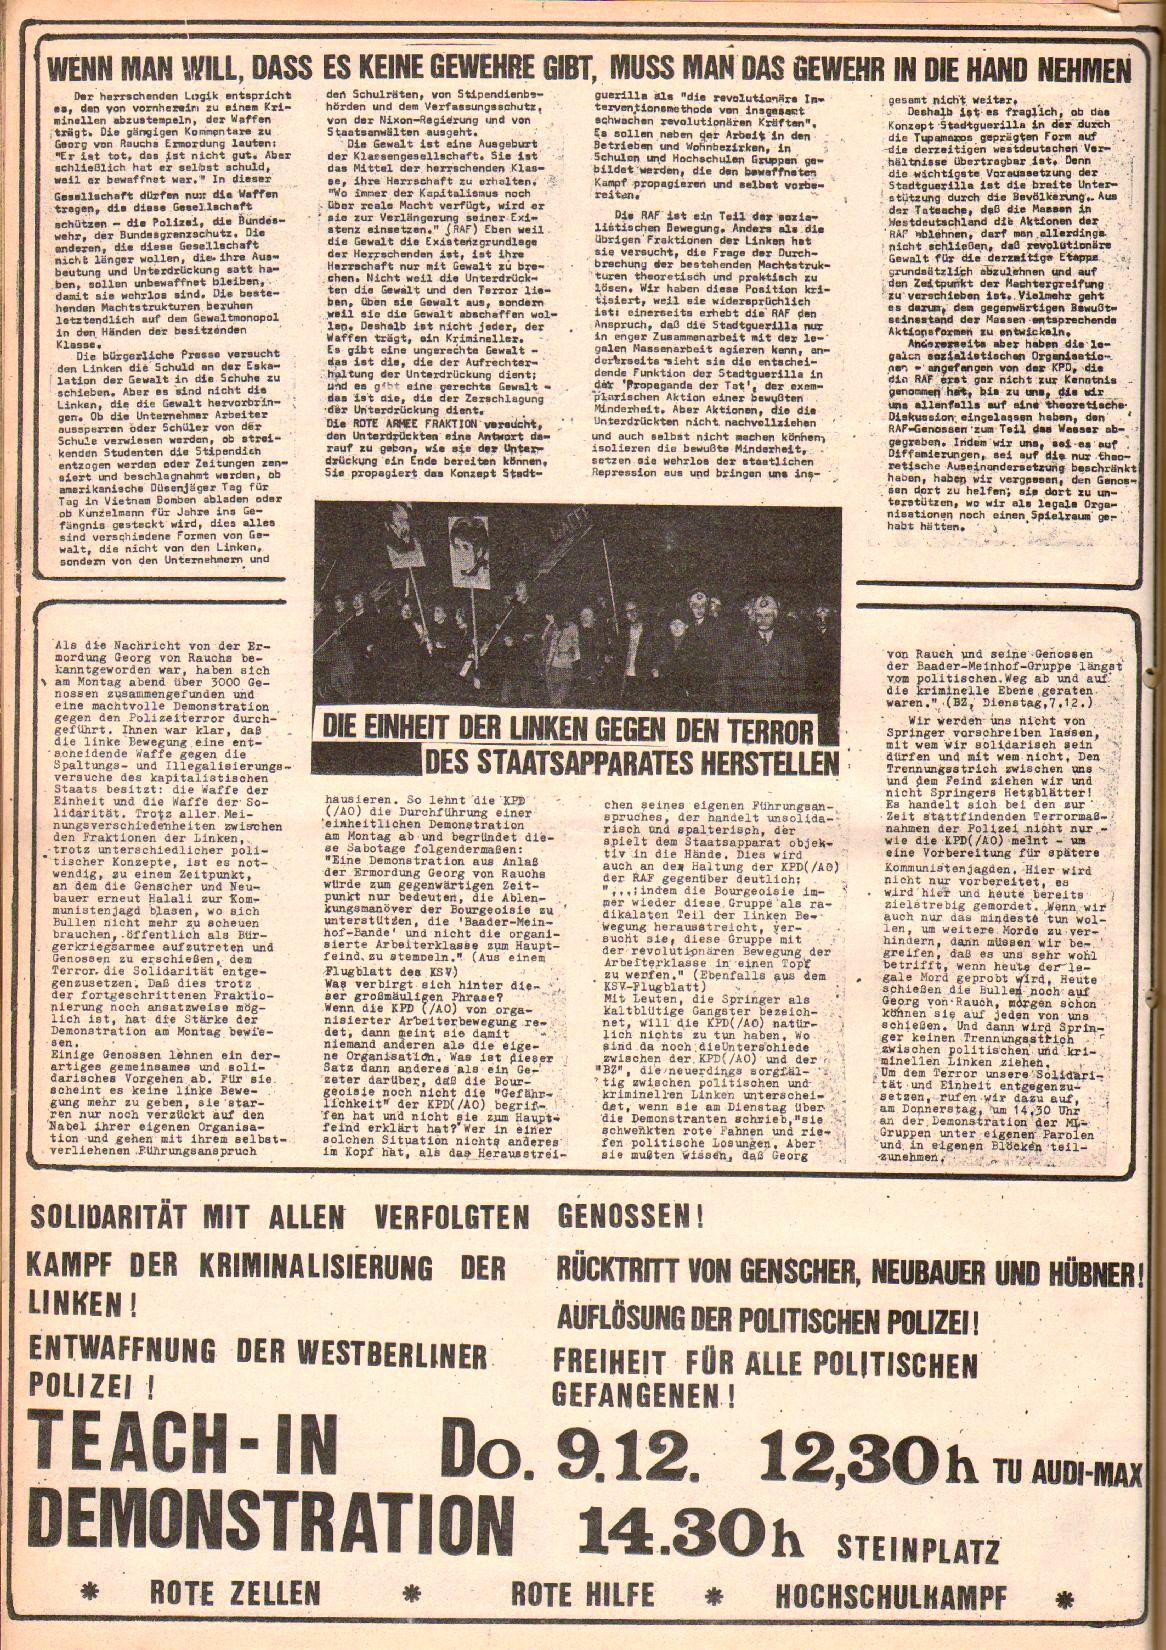 Berlin_Hochschulkampf_1971_21_04